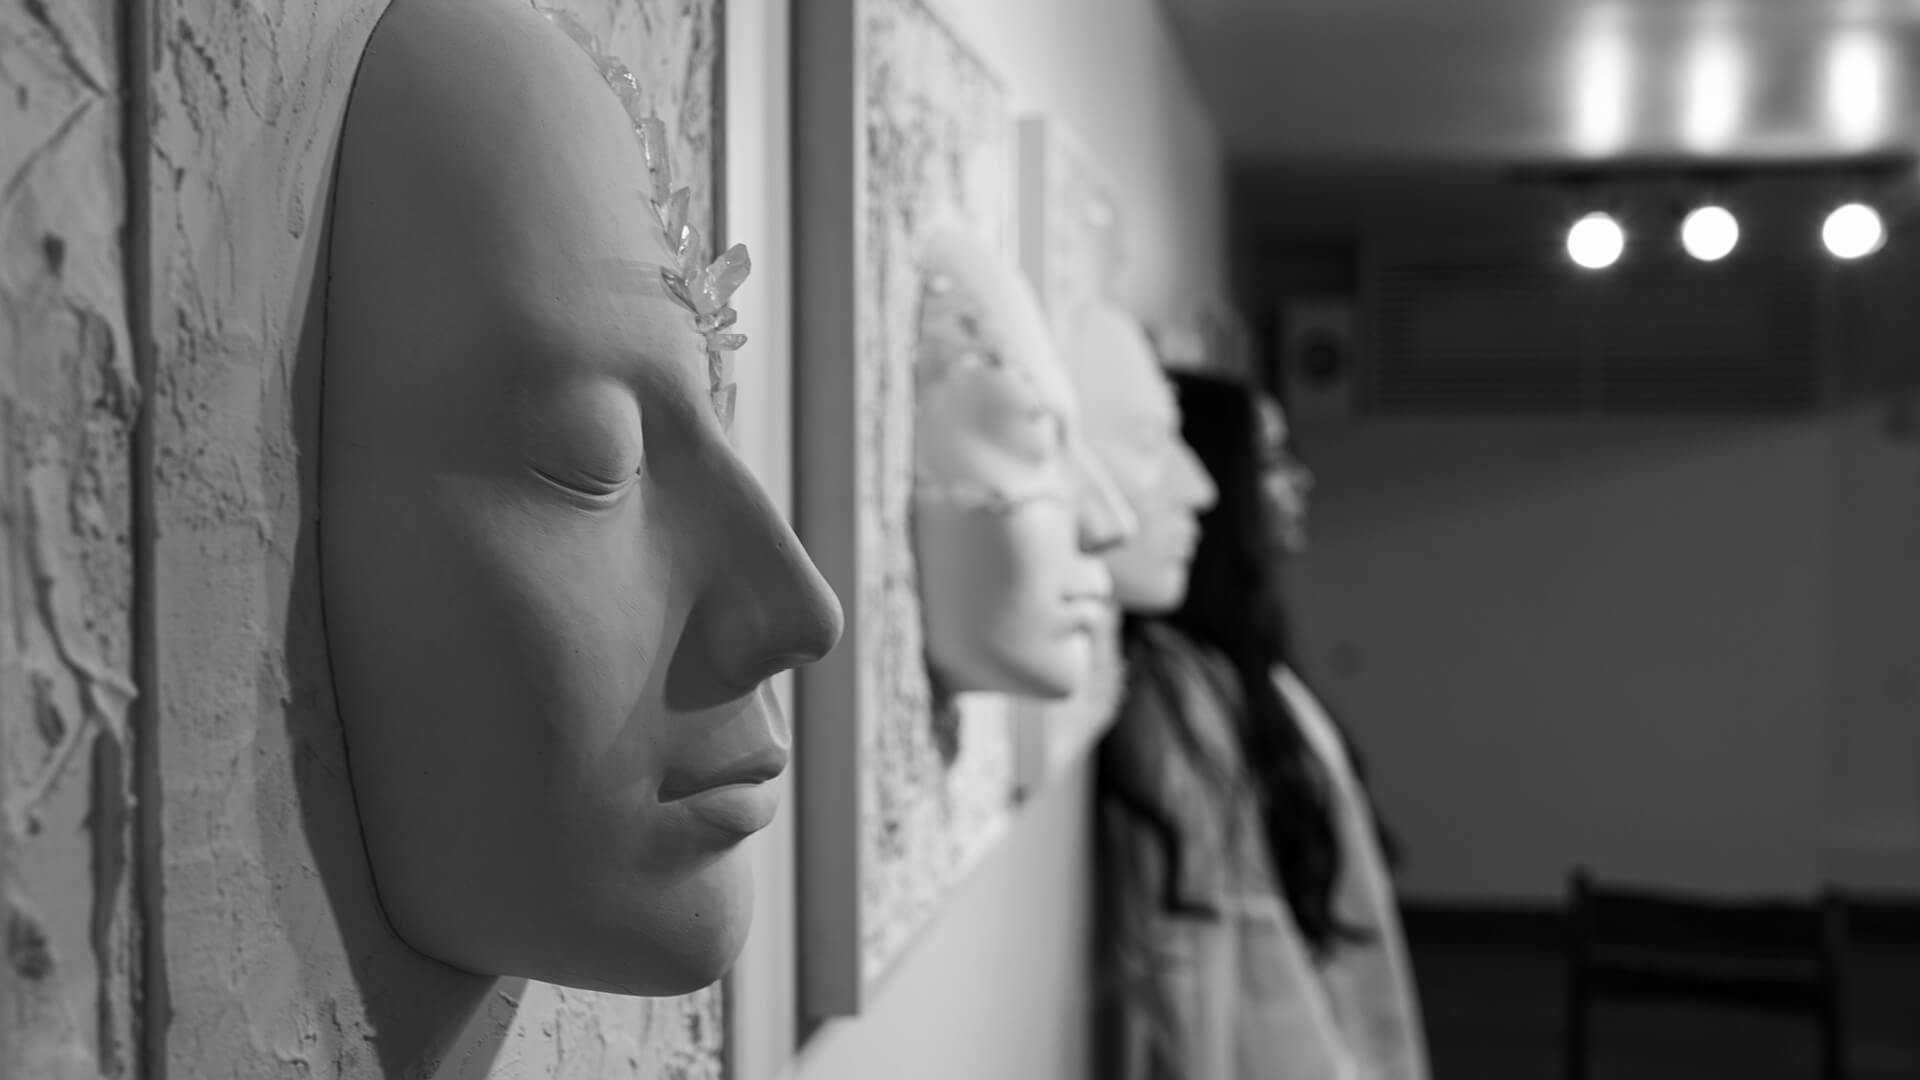 Artist Amonwan Mirpuri with her work at Method Art Space | Dear Women | Amonwan Mirpuri | STIRworld